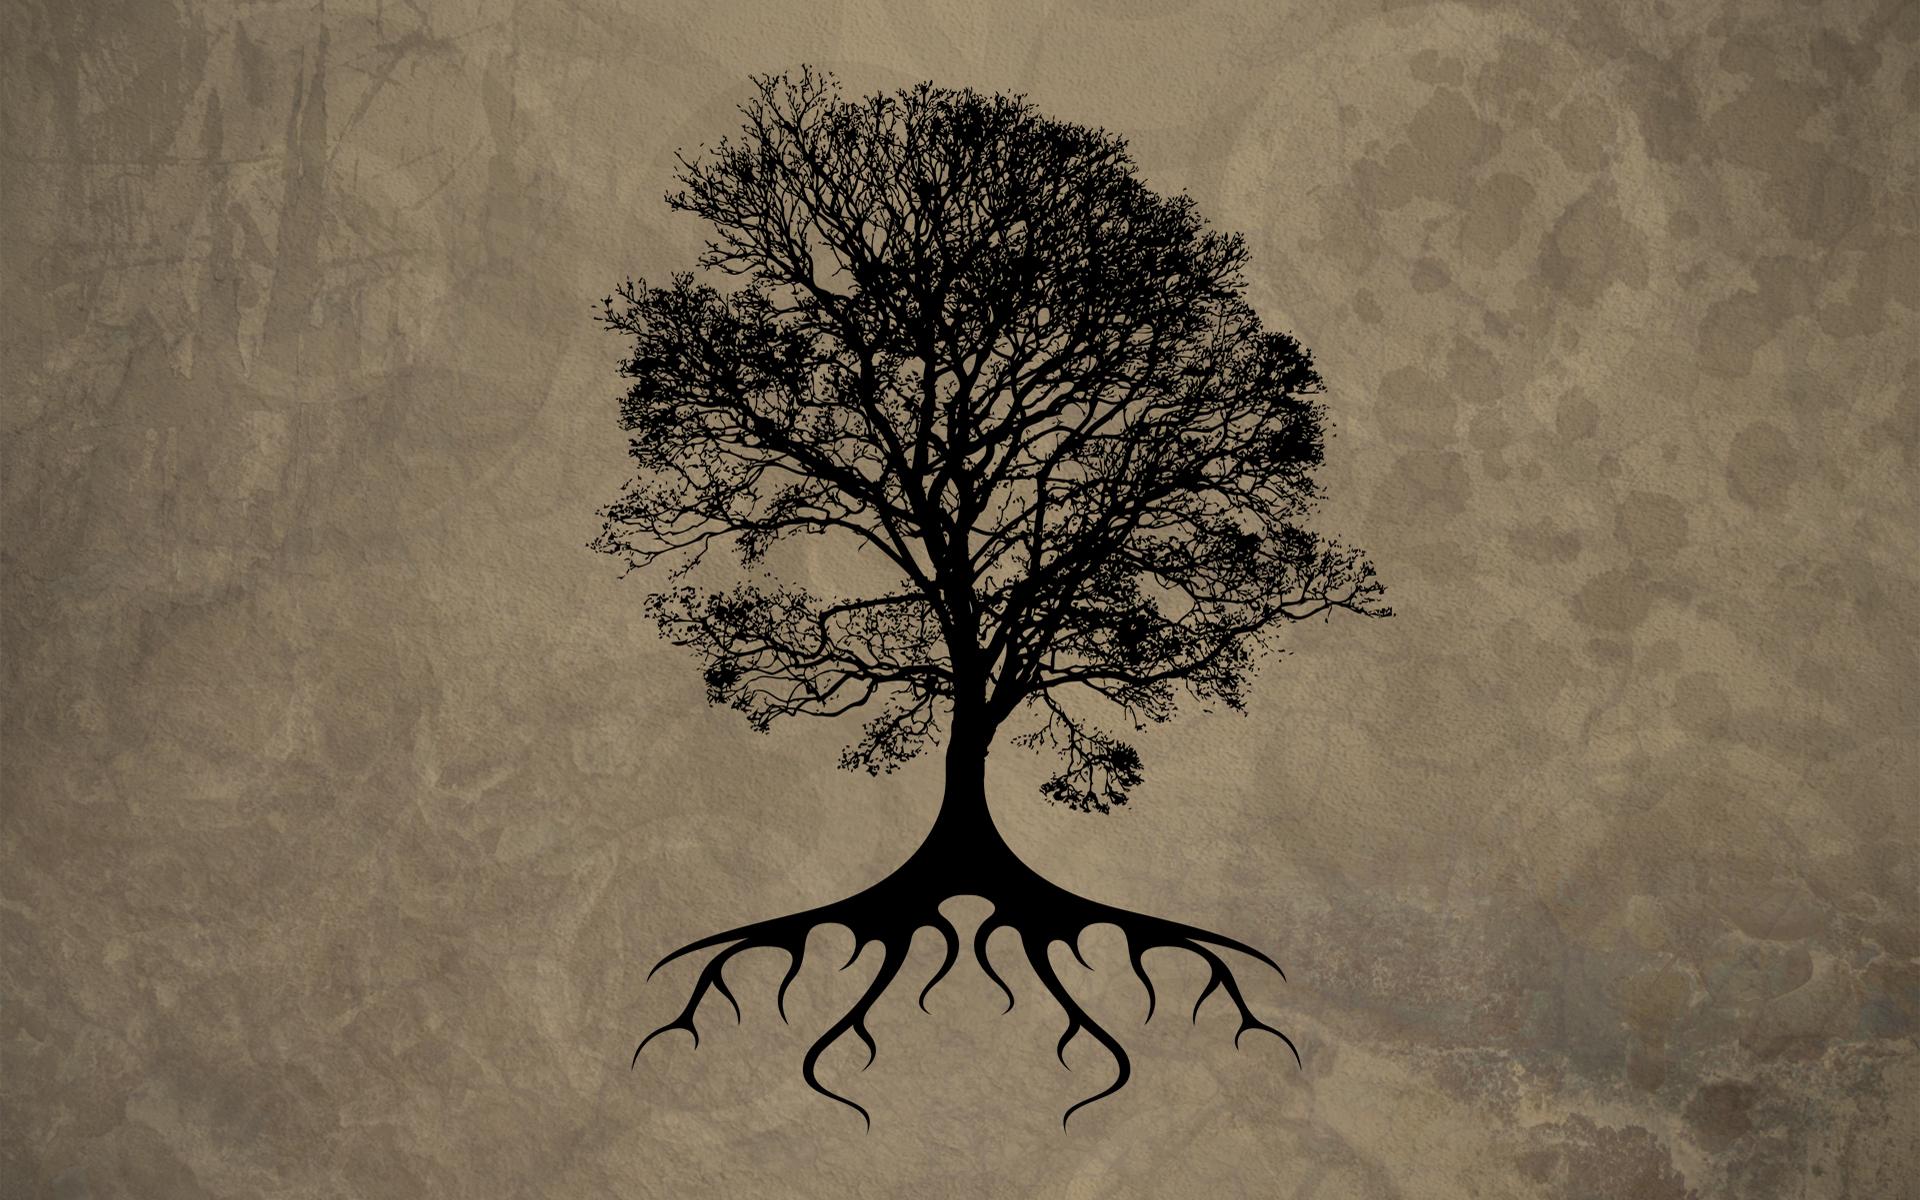 Tree Silhouette Wallpaper 34123 1920x1200 px